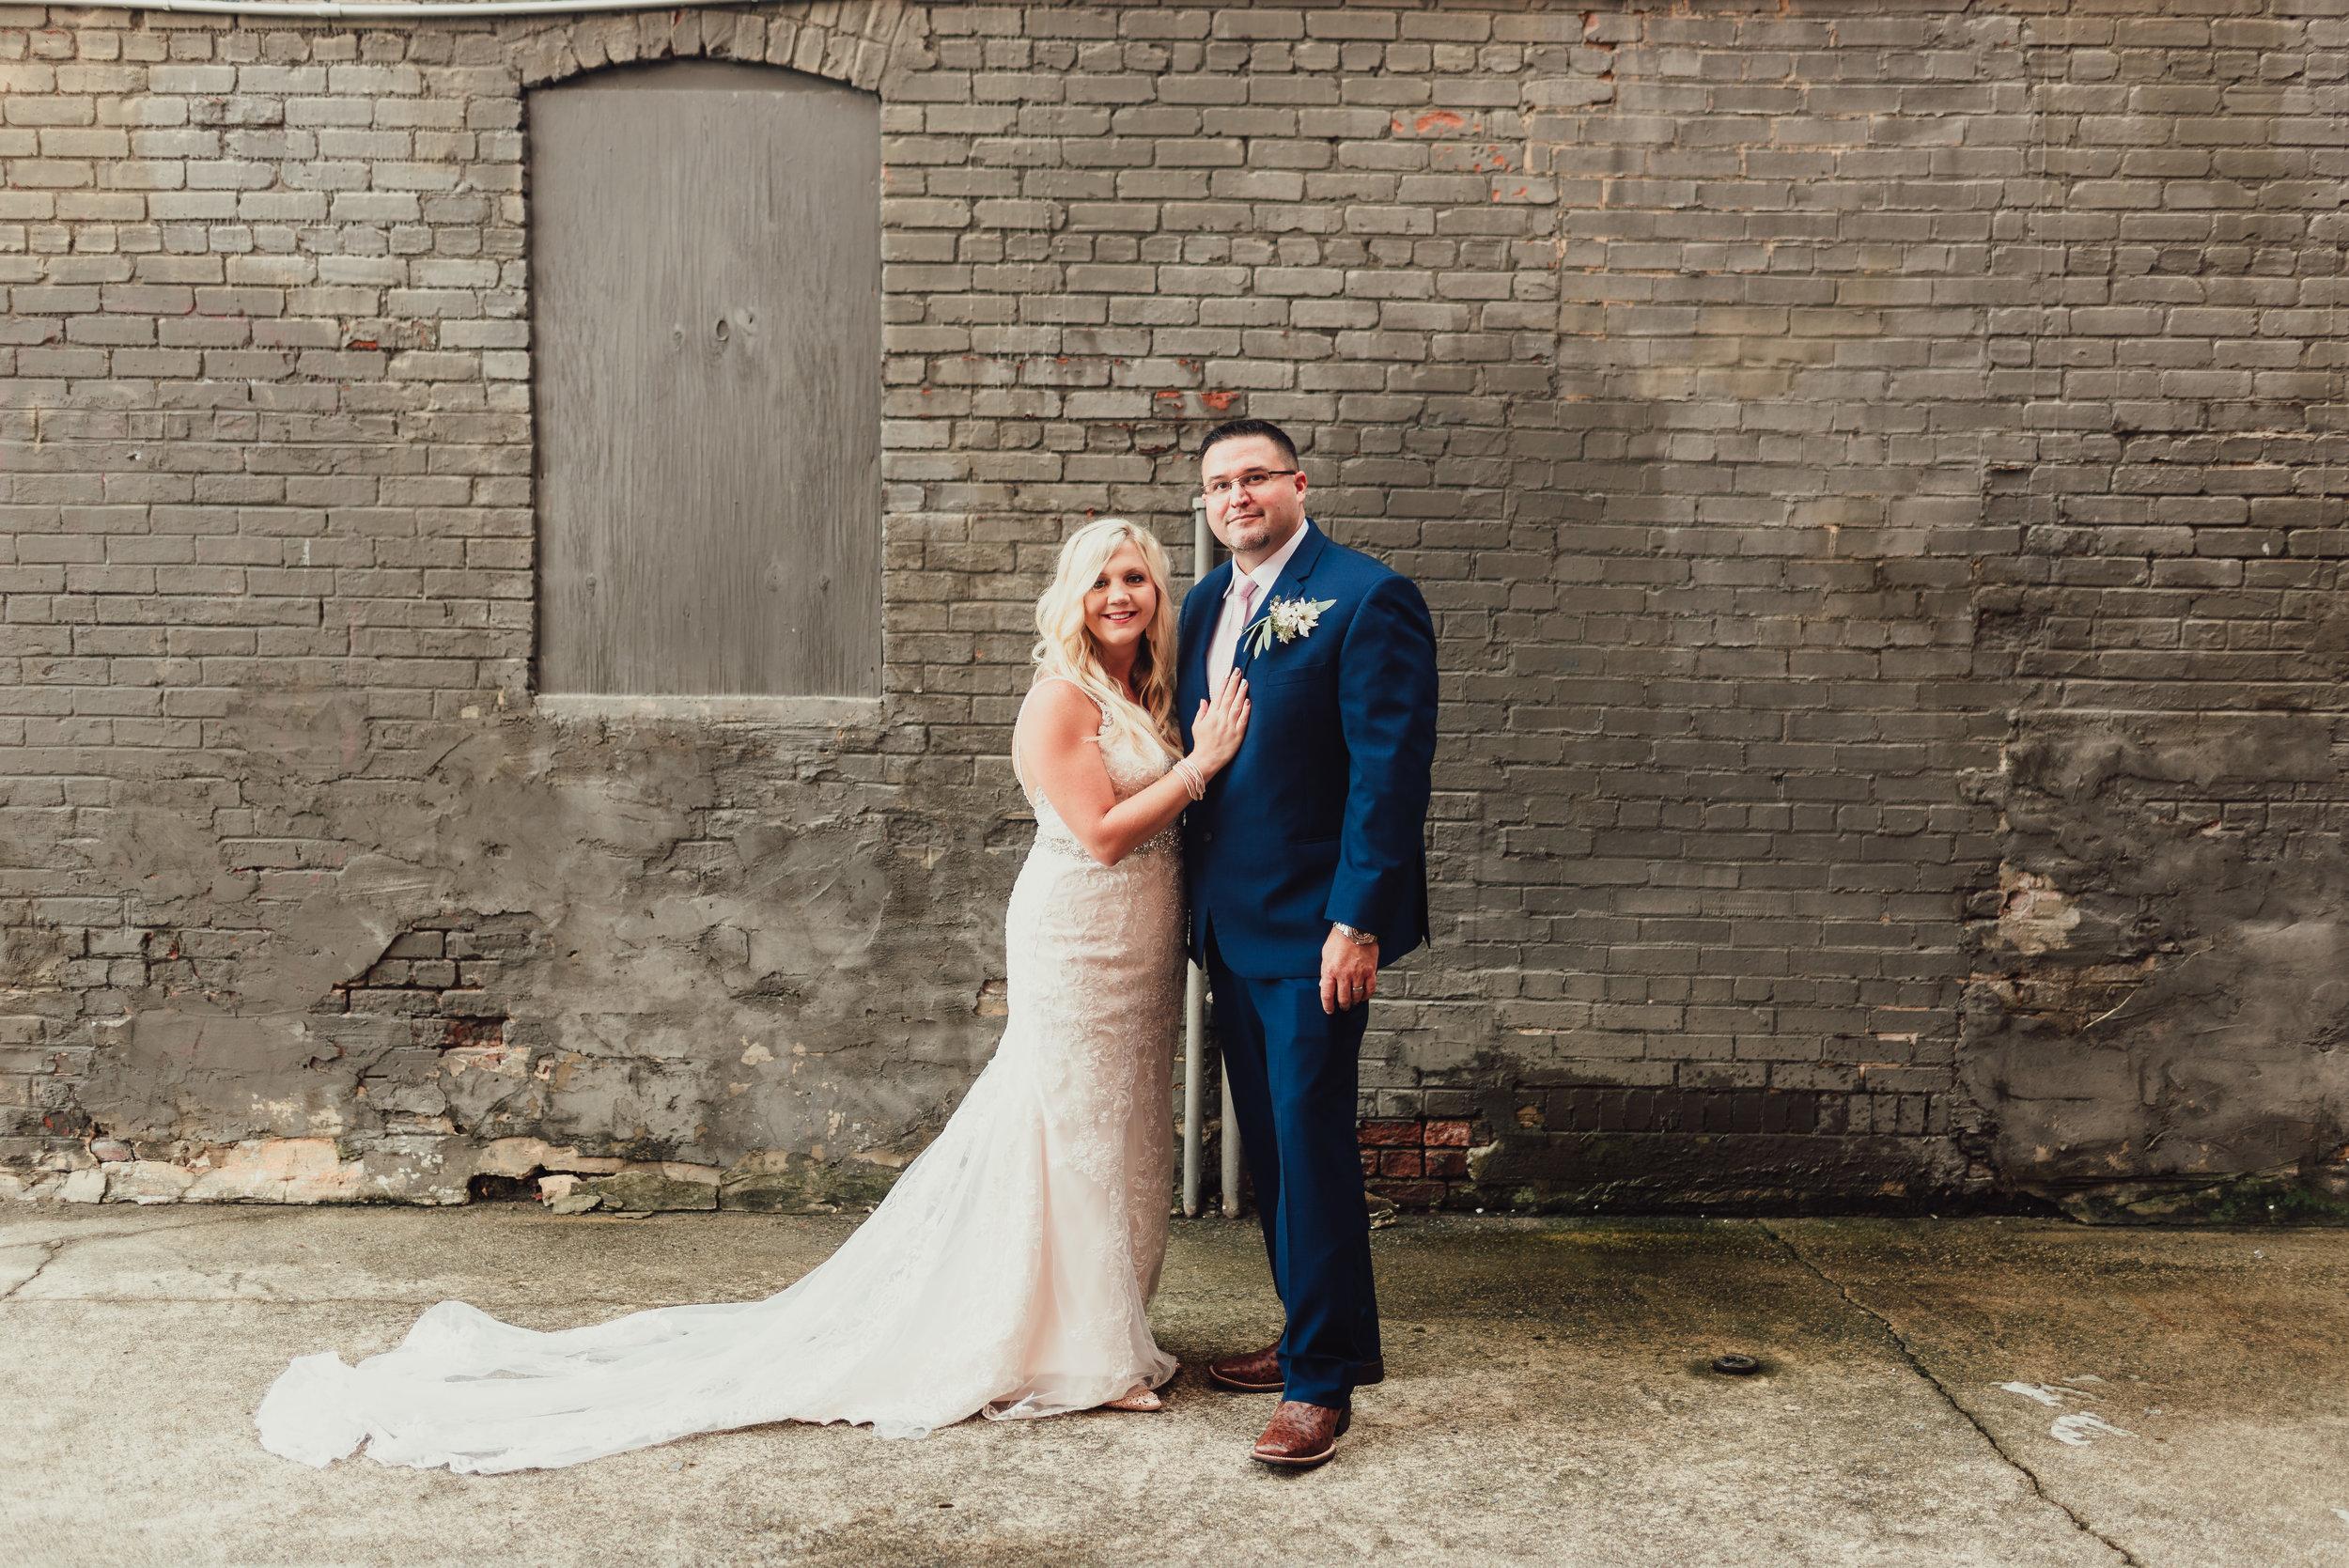 east-tn-wedding-photographer-tennessee-elopement-photographer-kingsport-tn-wedding-photographer (645 of 1001).jpg